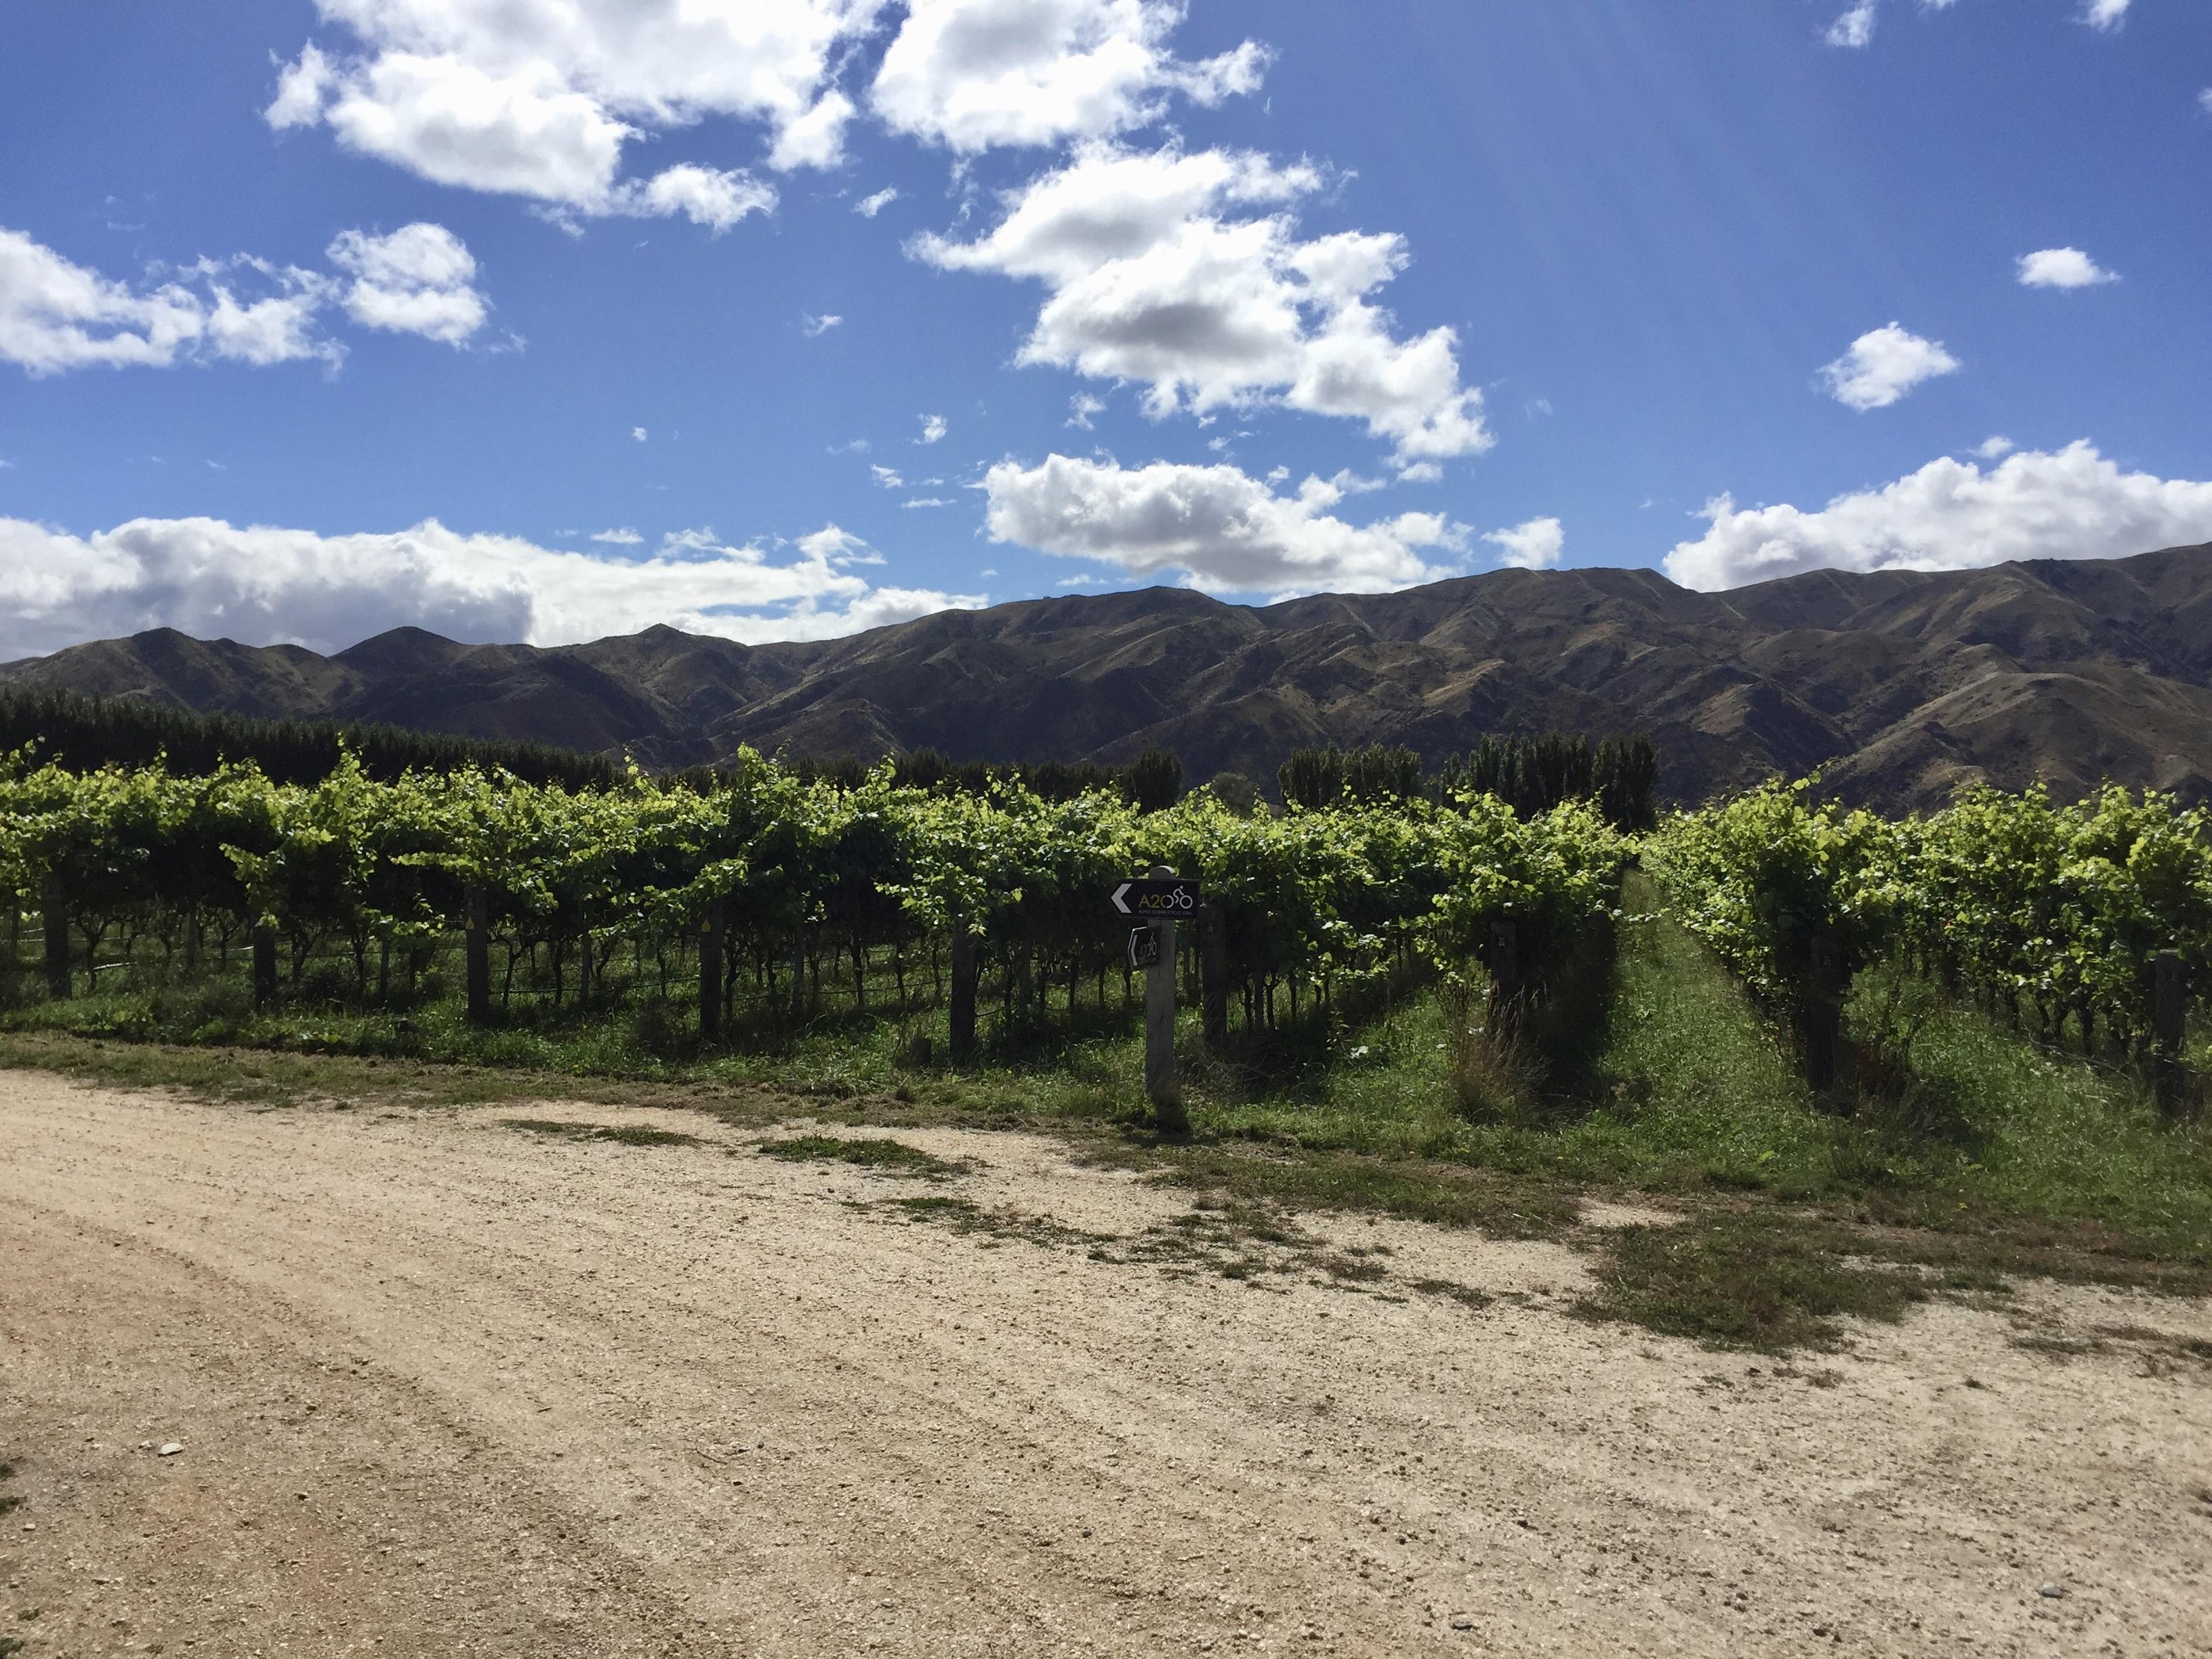 The trail went through the vinyard